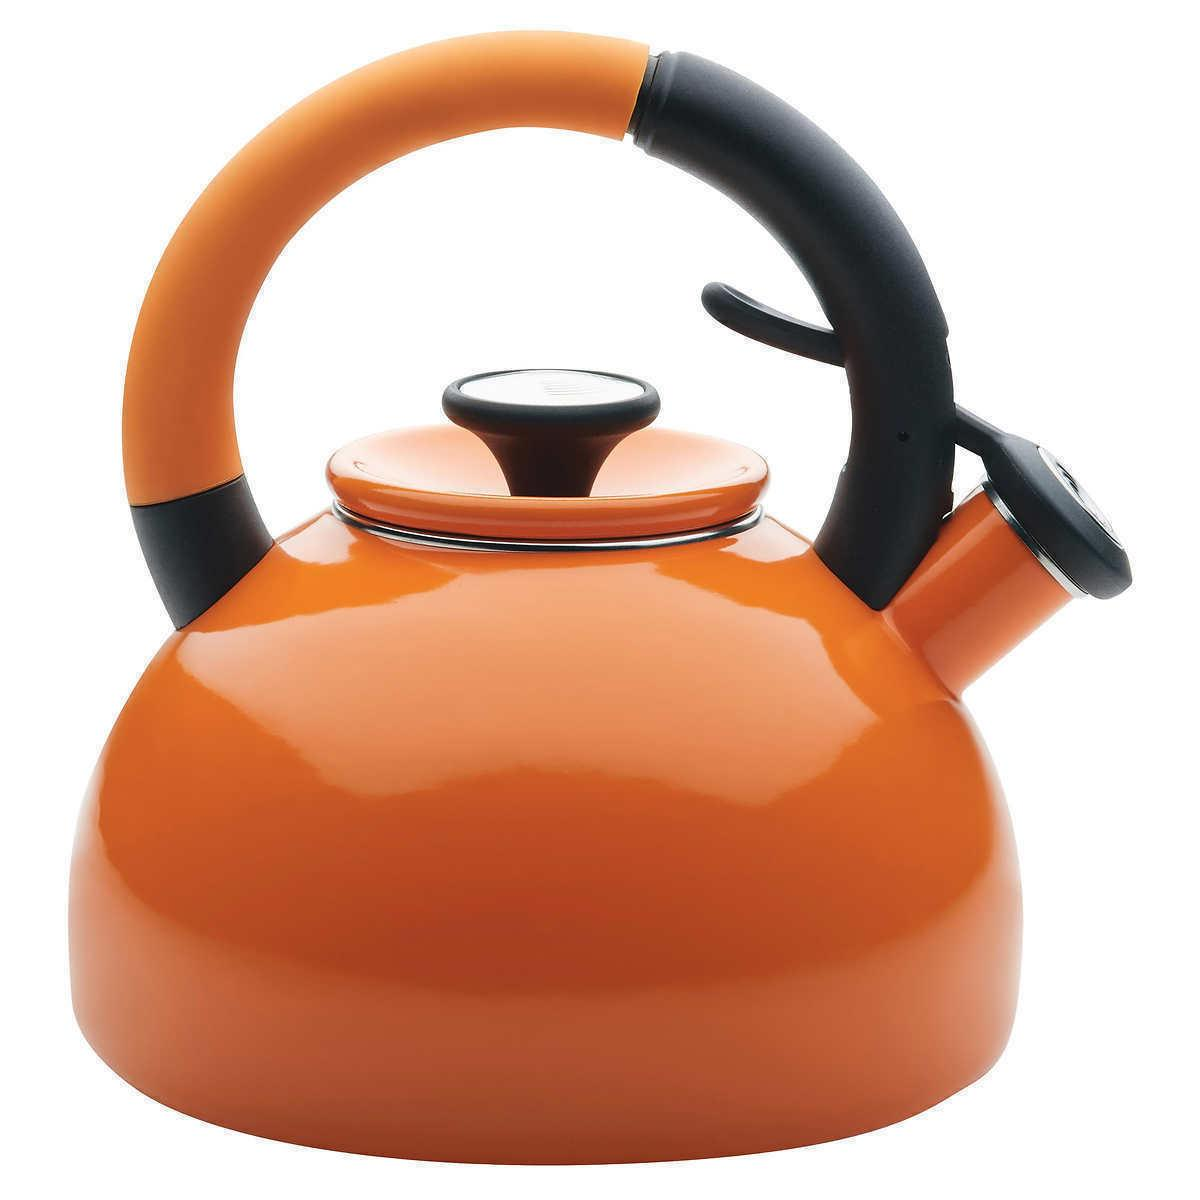 Tea Induction Circulon 2-quart Brew Ready Whistling Teapot